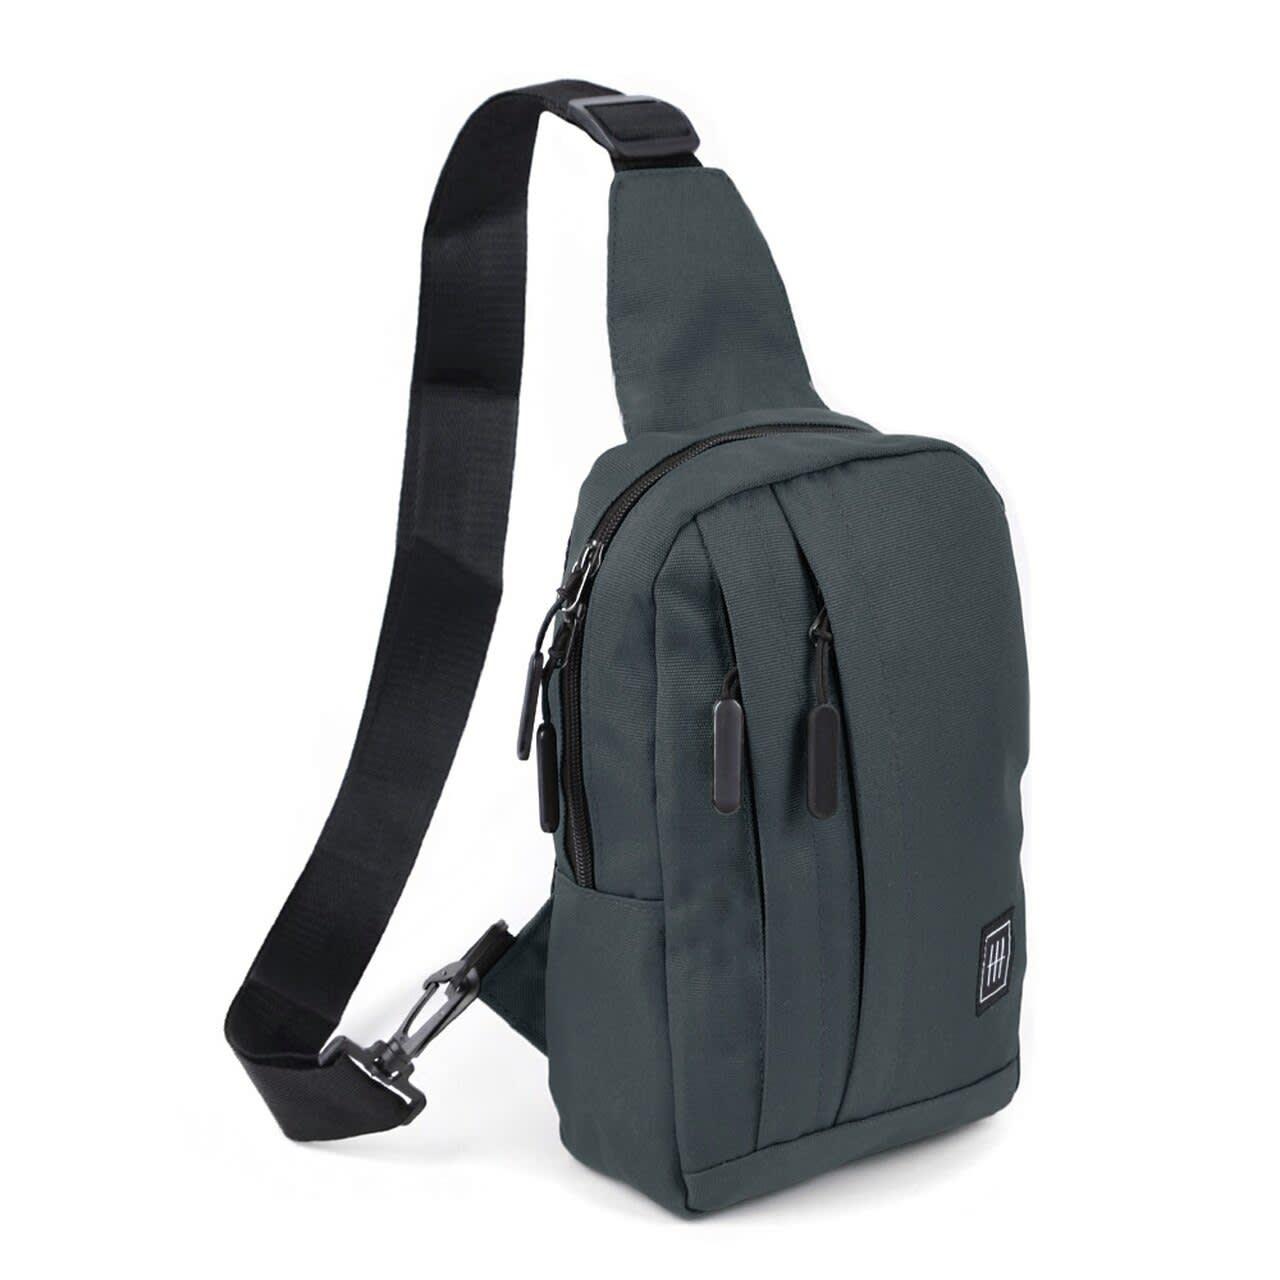 Crossbody Sling Bag W/ Reversible Strap - Charcoal - Back